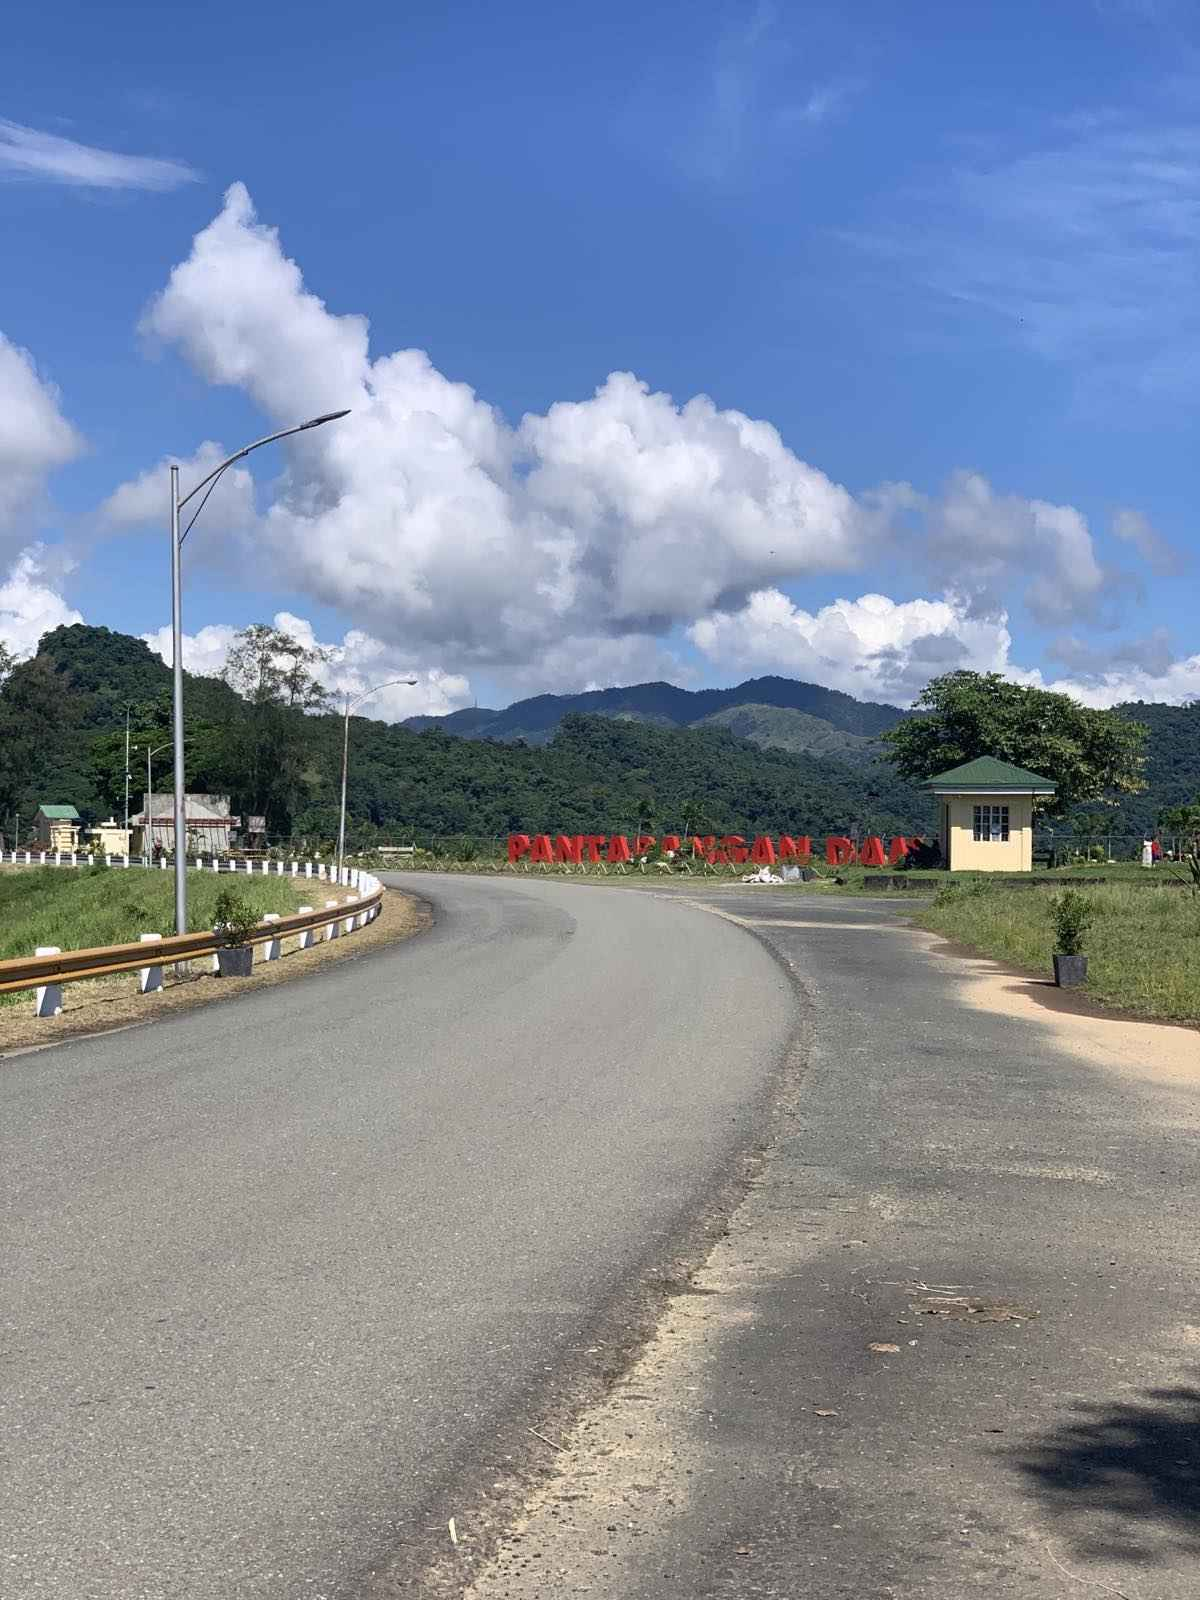 06-PANTABANGAN OCTOBER 2019-10.jpg